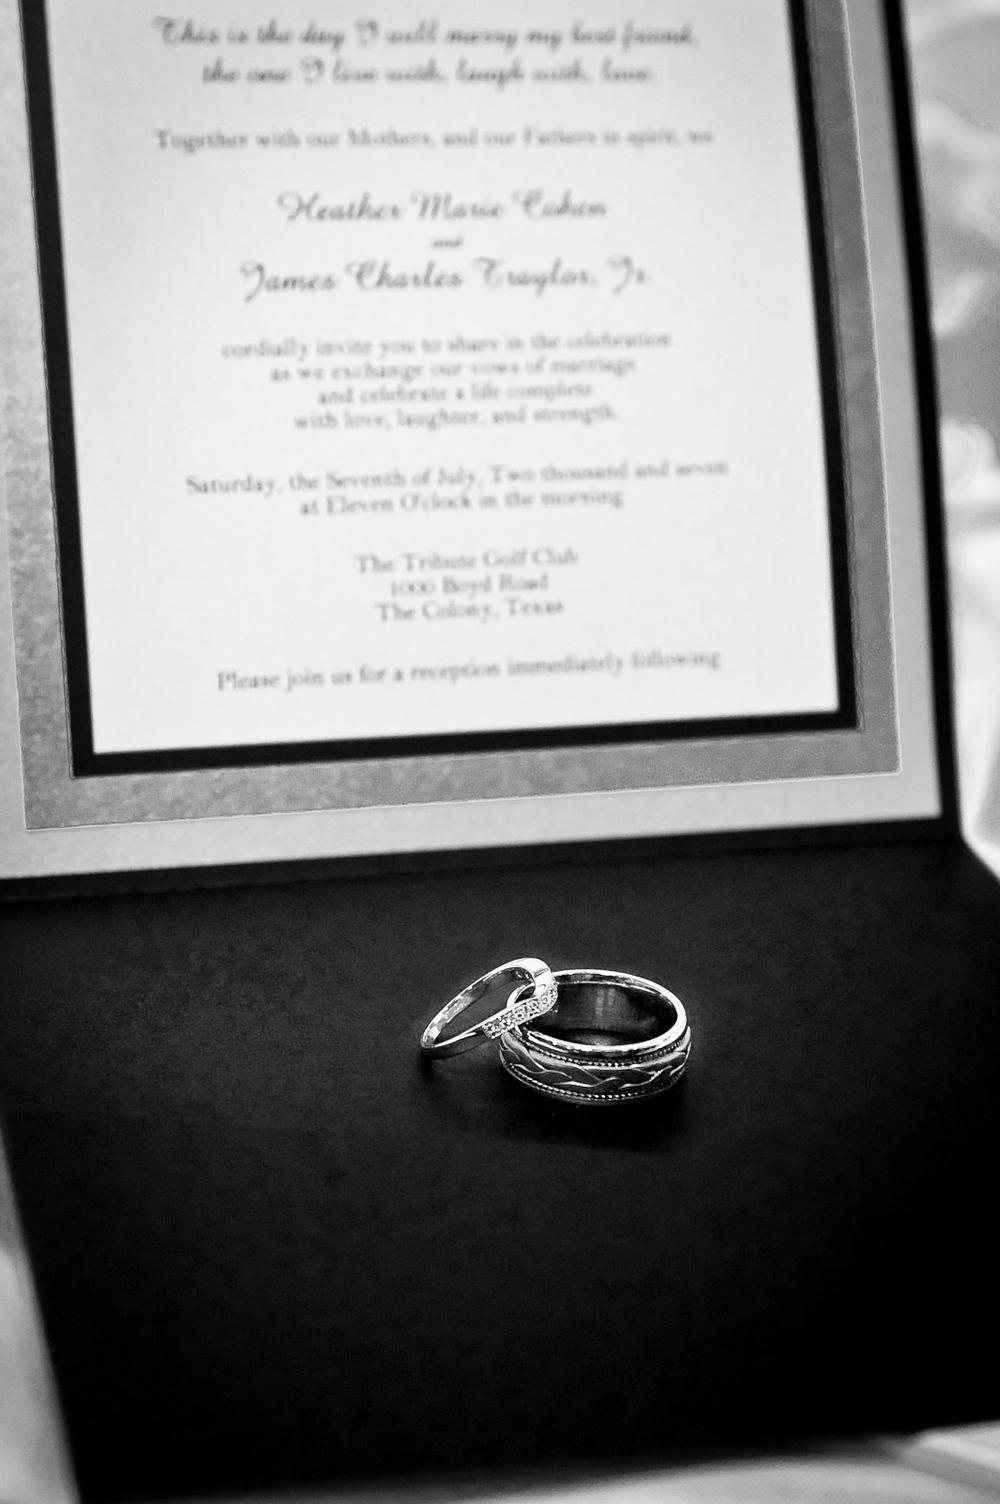 Michael-Napier-Weddings-Traylor-Cohen-Wedding-Album- (6).jpg